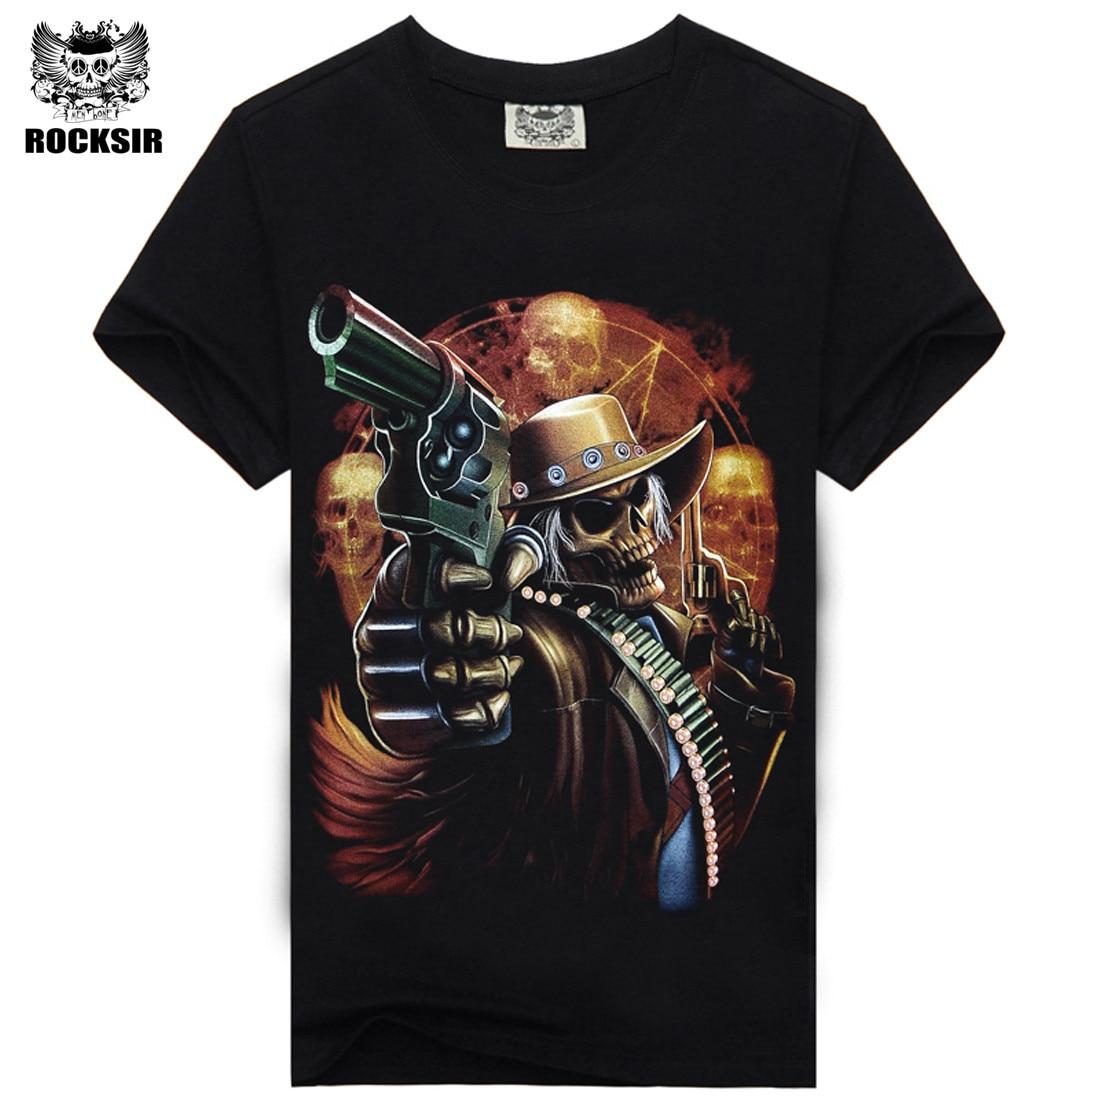 [Rocksir] 2017 új komor Reaper Skull Pursuers Design tshirt homme - Férfi ruházat